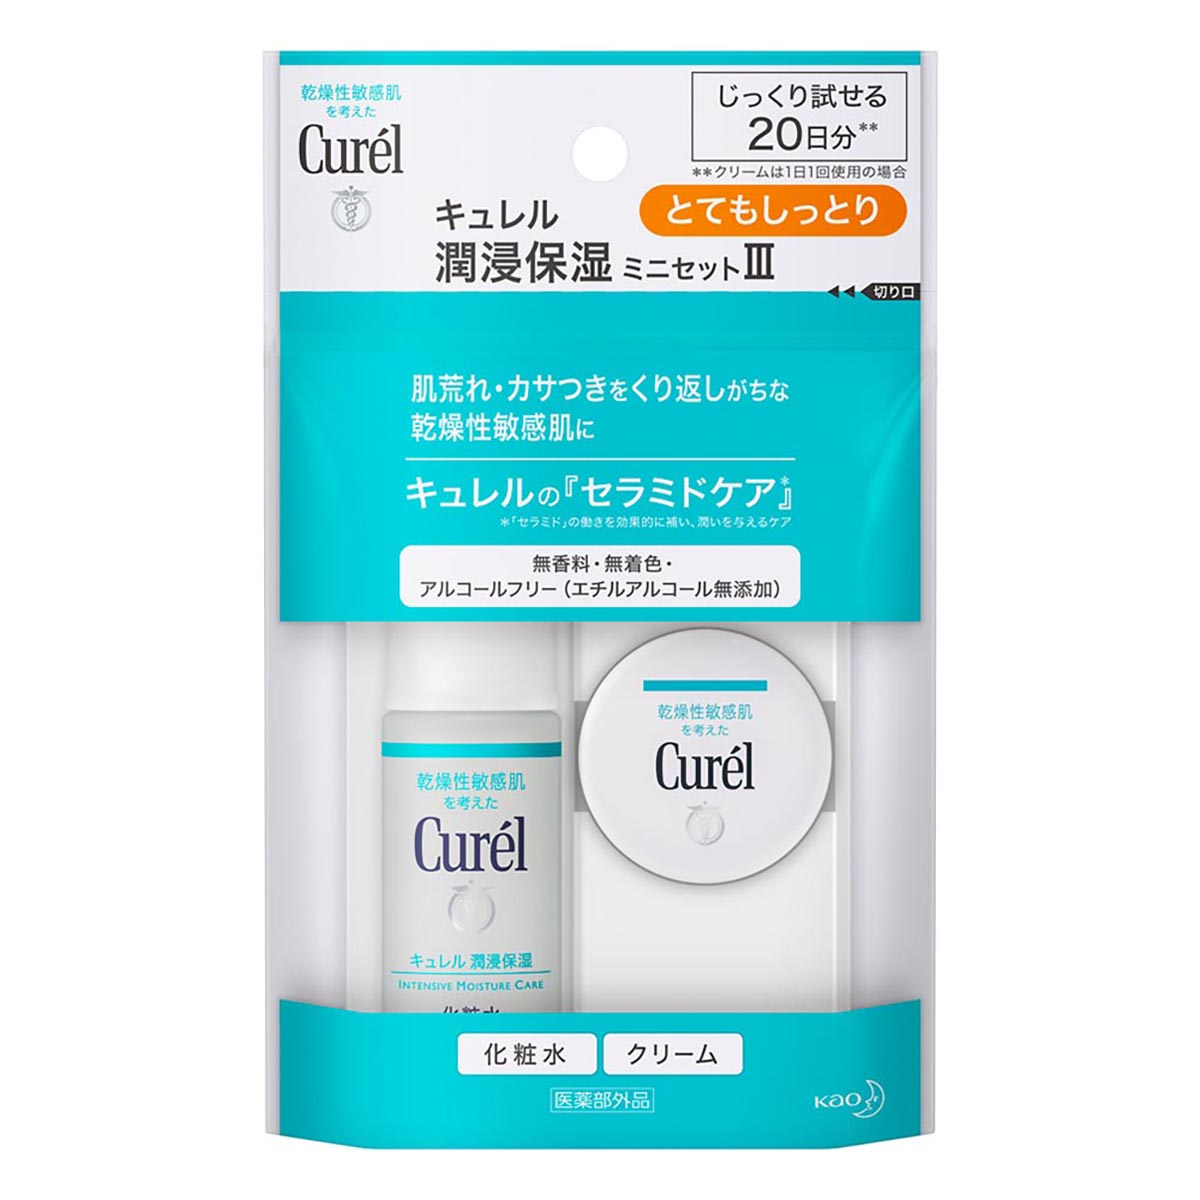 Curel珂潤潤浸保濕體驗組(潤澤型) 【康是美】